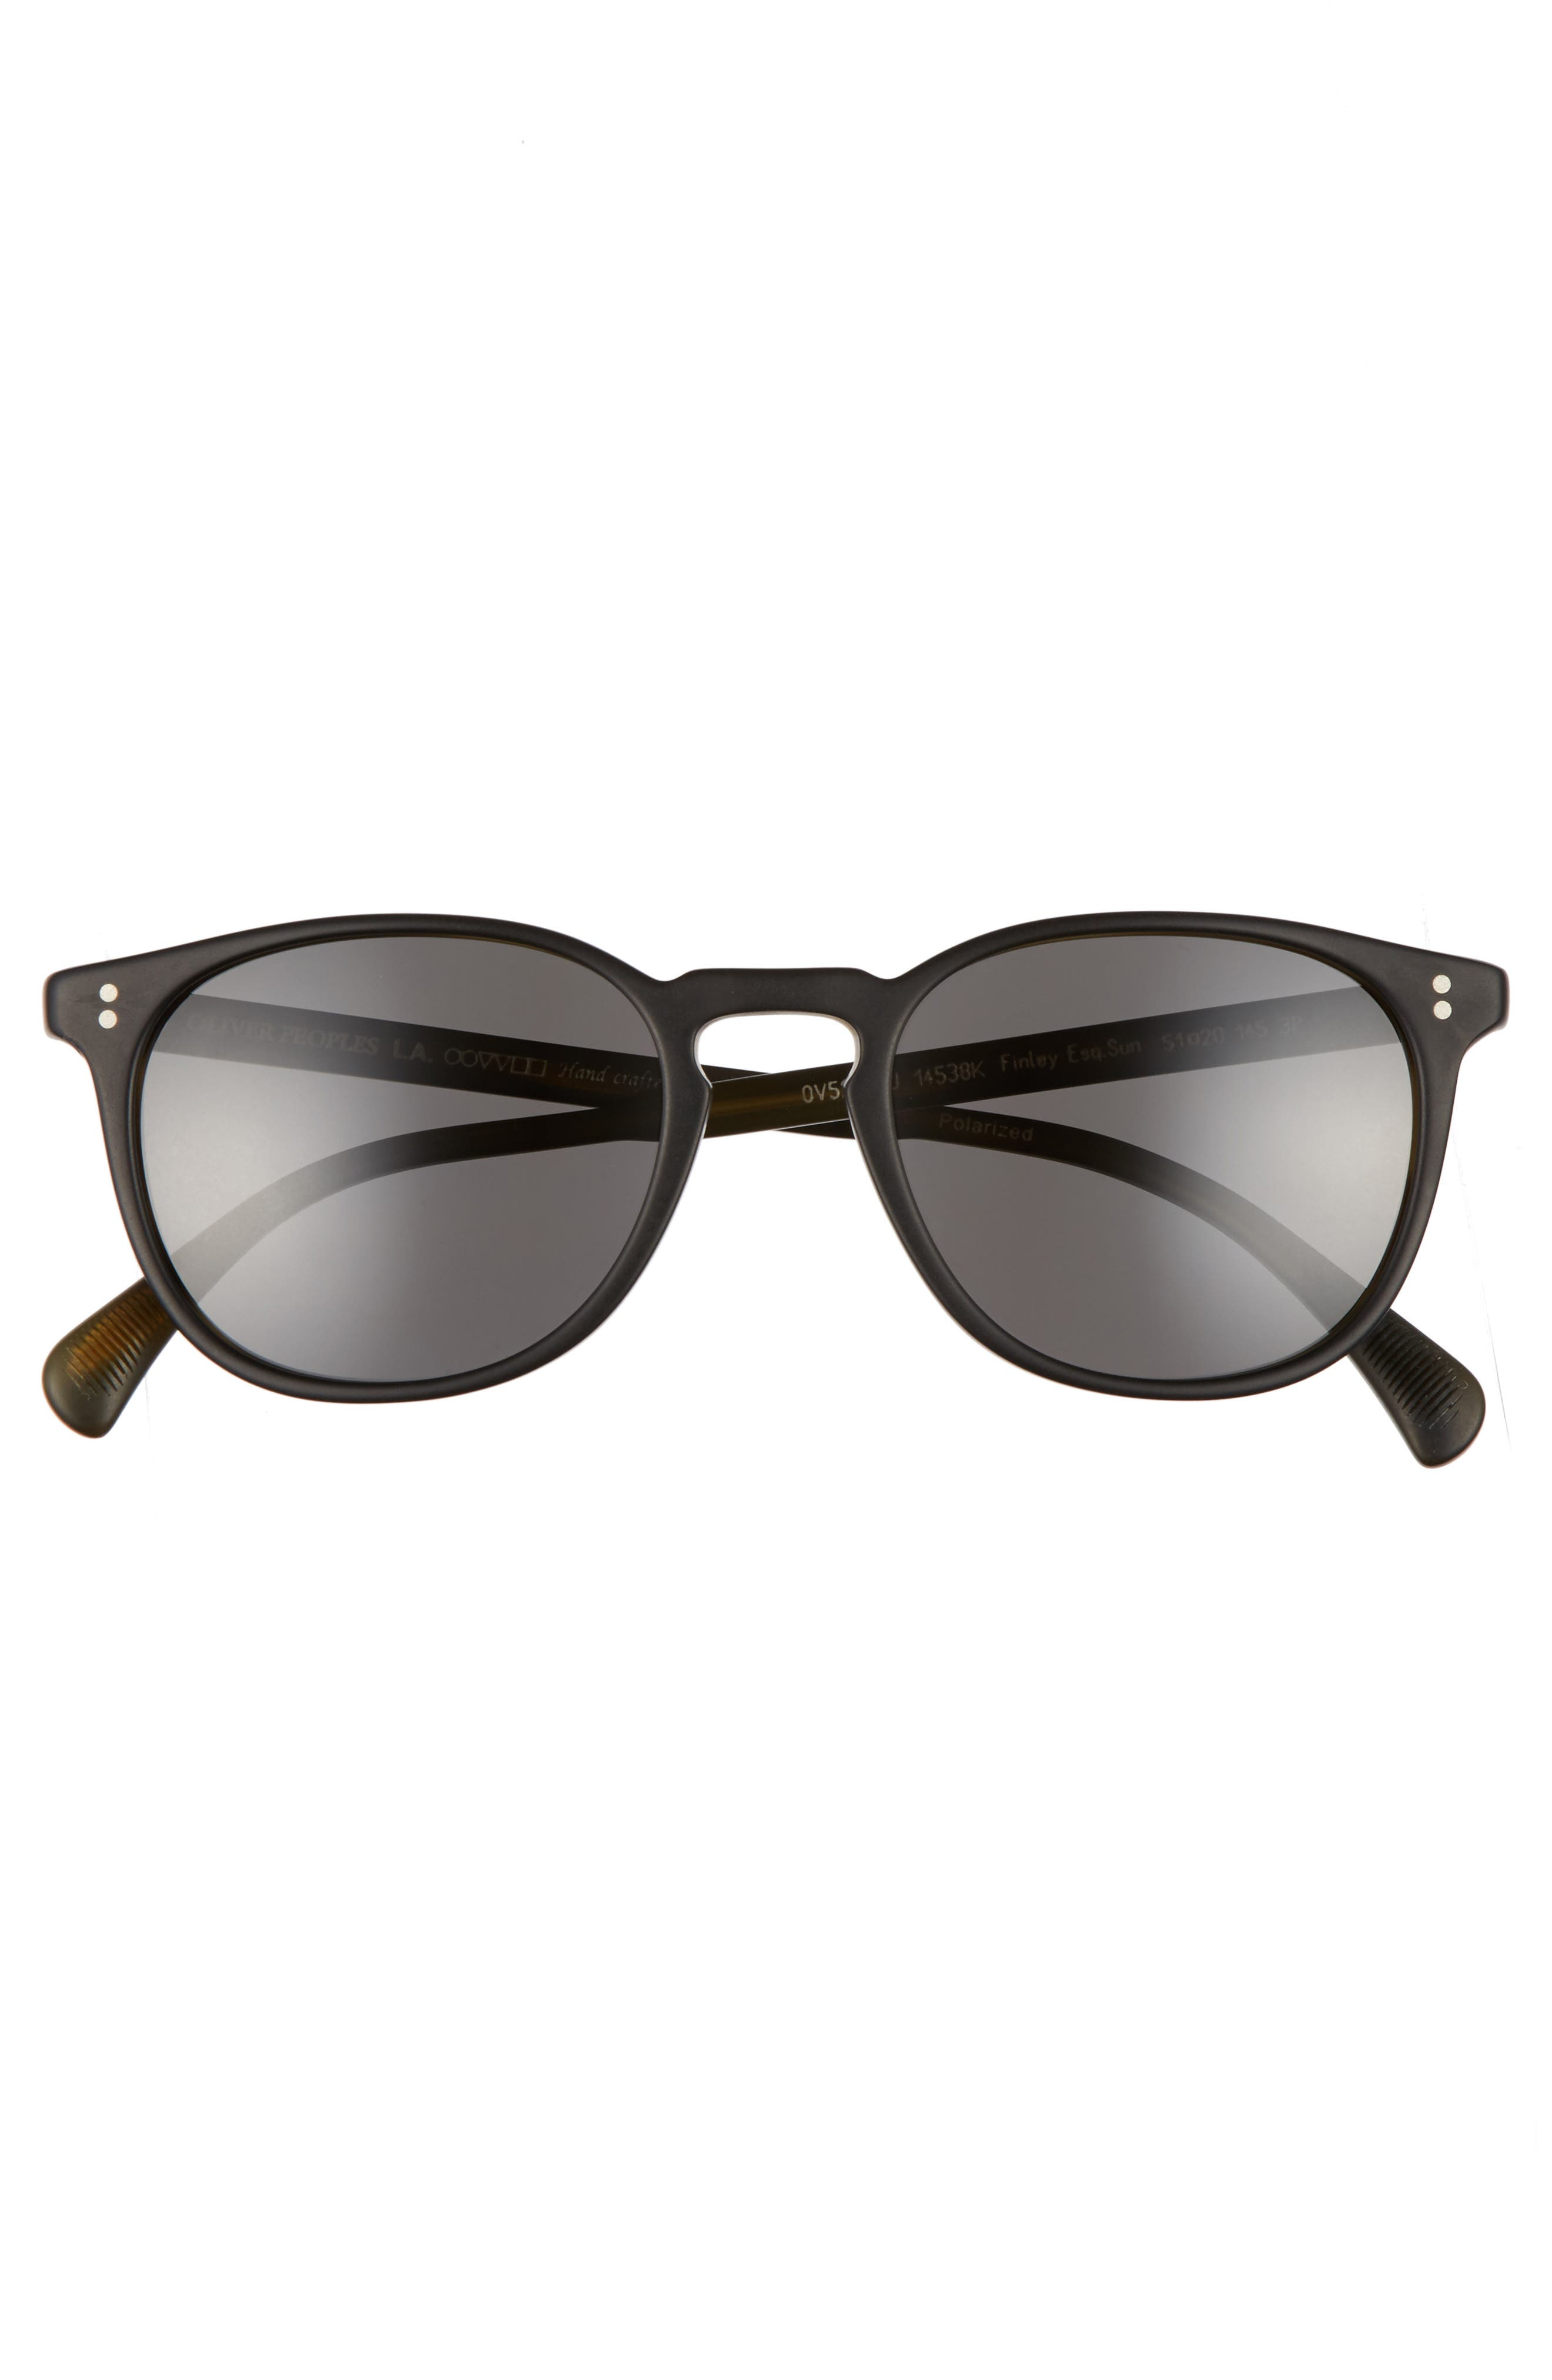 Finley 51mm Retro Polarized Sunglasses,                             Alternate thumbnail 2, color,                             Black